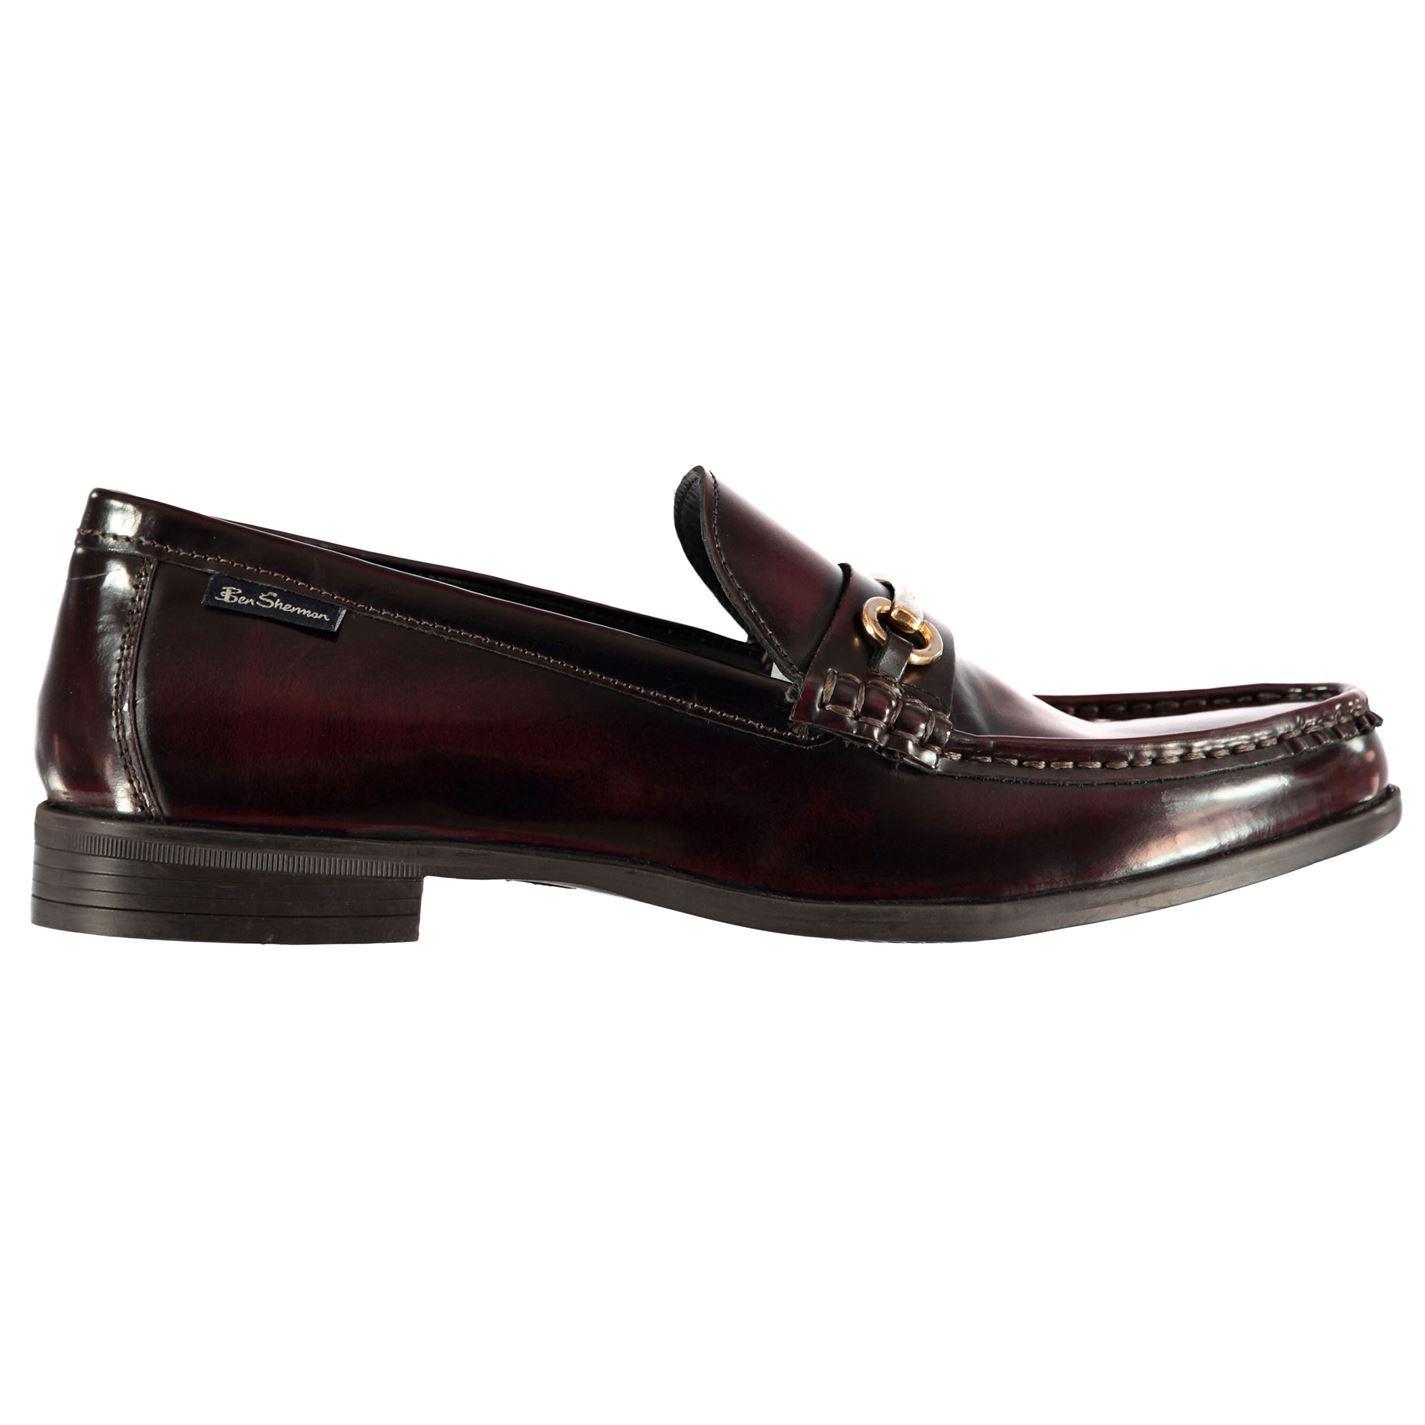 Ben-Sherman-Luca-Loafers-Slip-On-Shoes-Mens-Formal-Footwear-Flats thumbnail 8